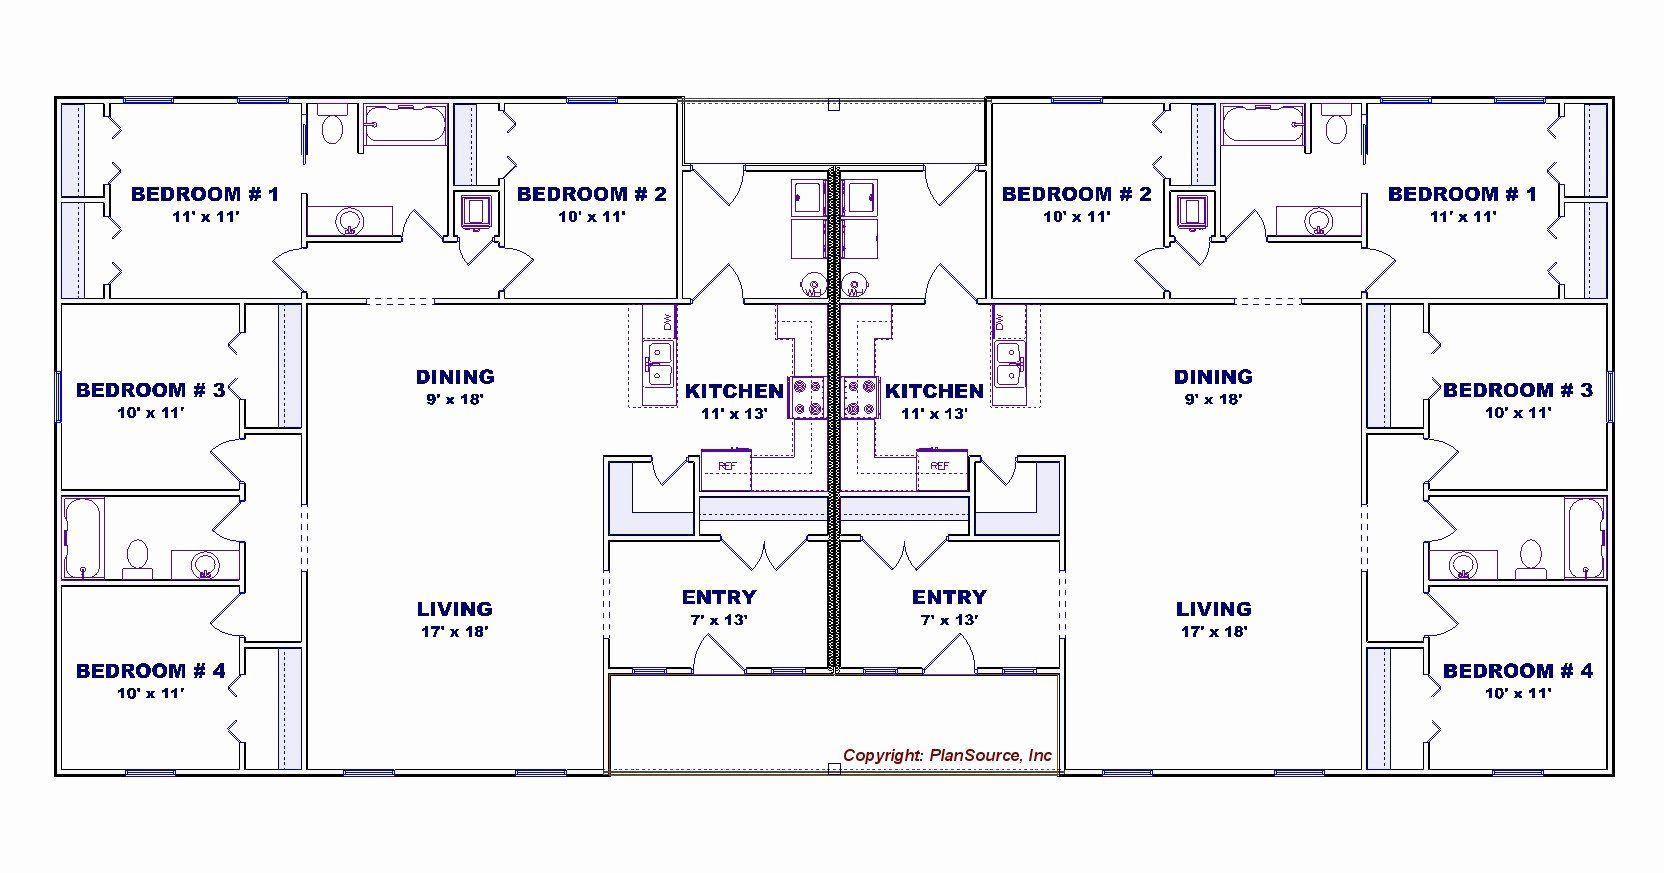 Duplex House Plans 4 Bedrooms Inspirational 4 Bedroom Duplex House Plan J0602 13d In 2020 Duplex Floor Plans Duplex House Plans House Plans